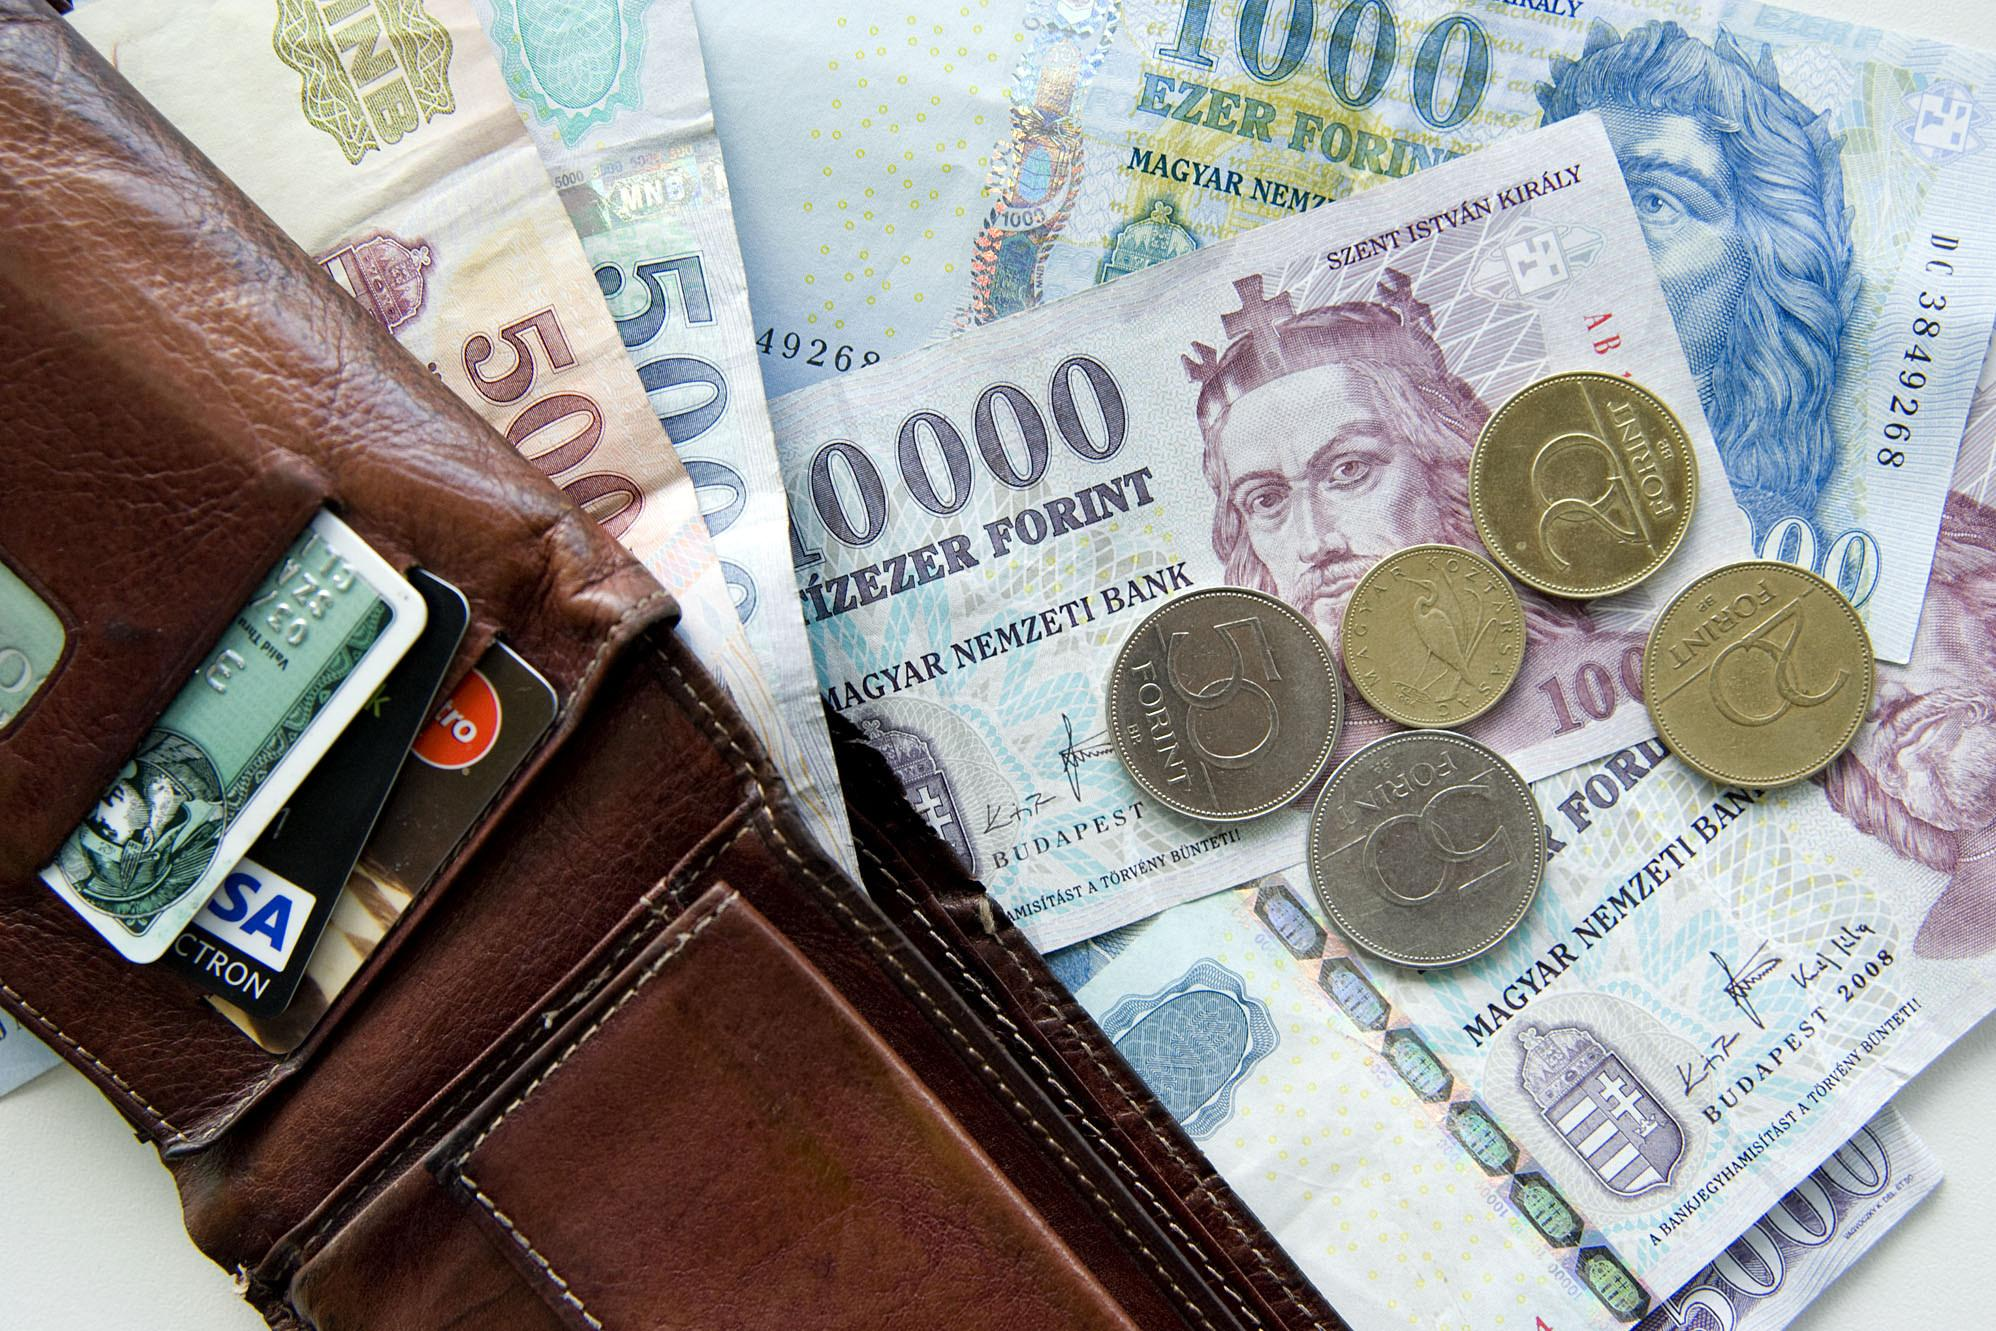 20150528forint-penz-penzugyek-penztarca-bankkartya1.jpg